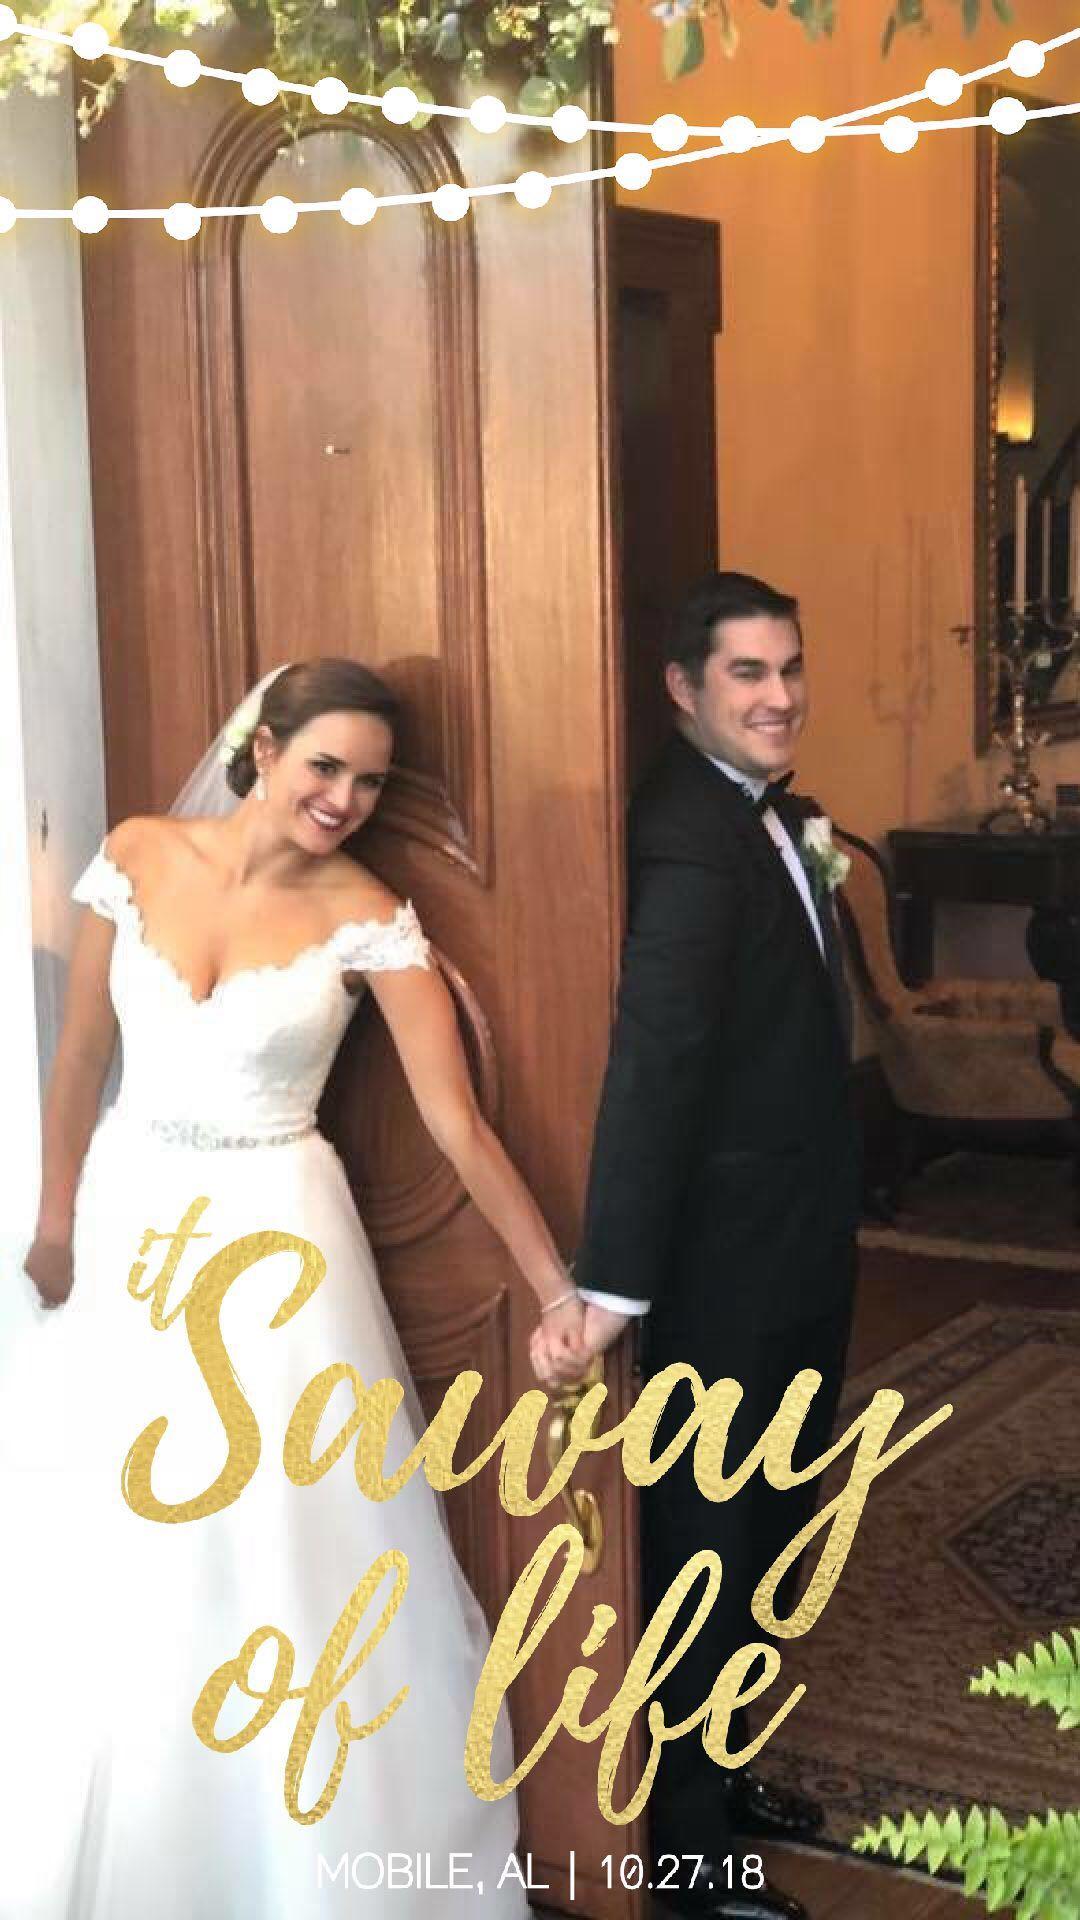 Saway Wedding // Mobile, AL